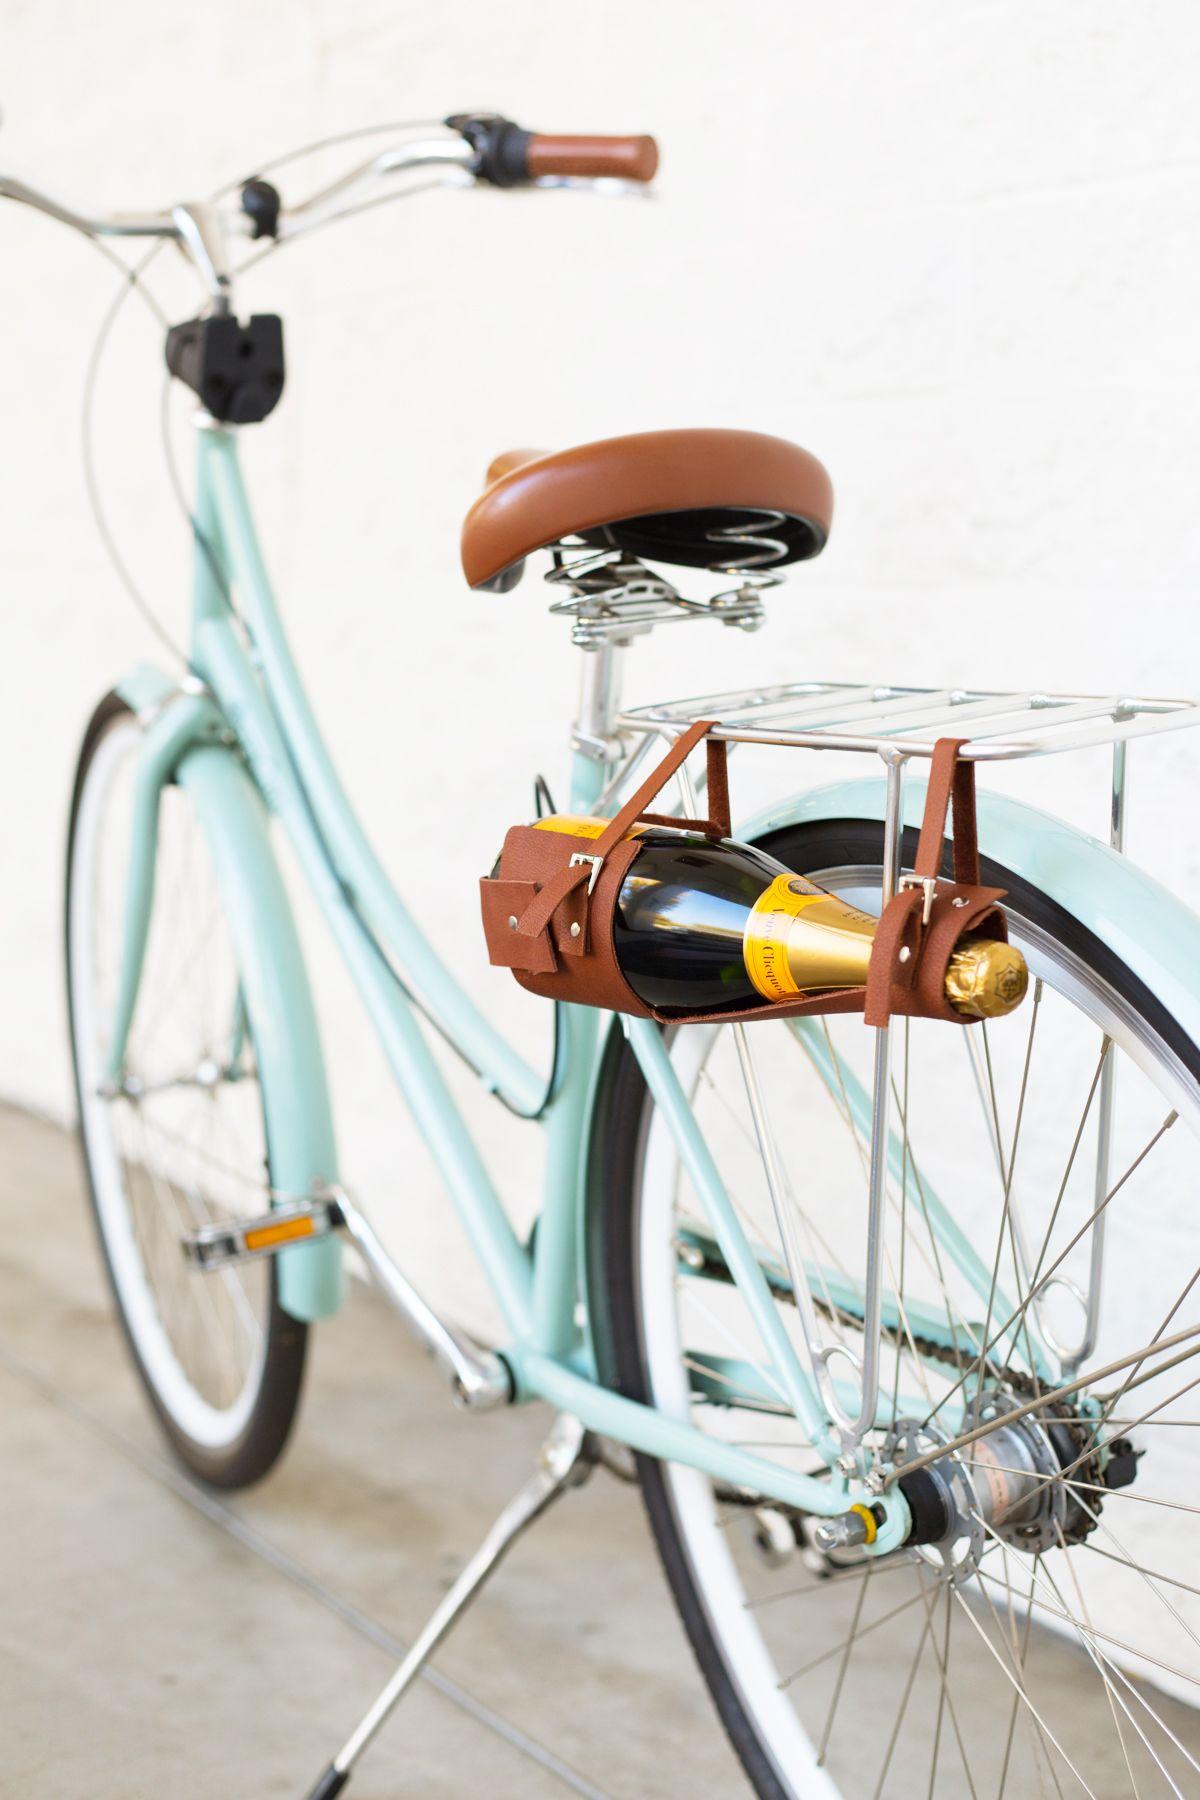 Diy wine bottle carrier bike giveaway lovely indeed